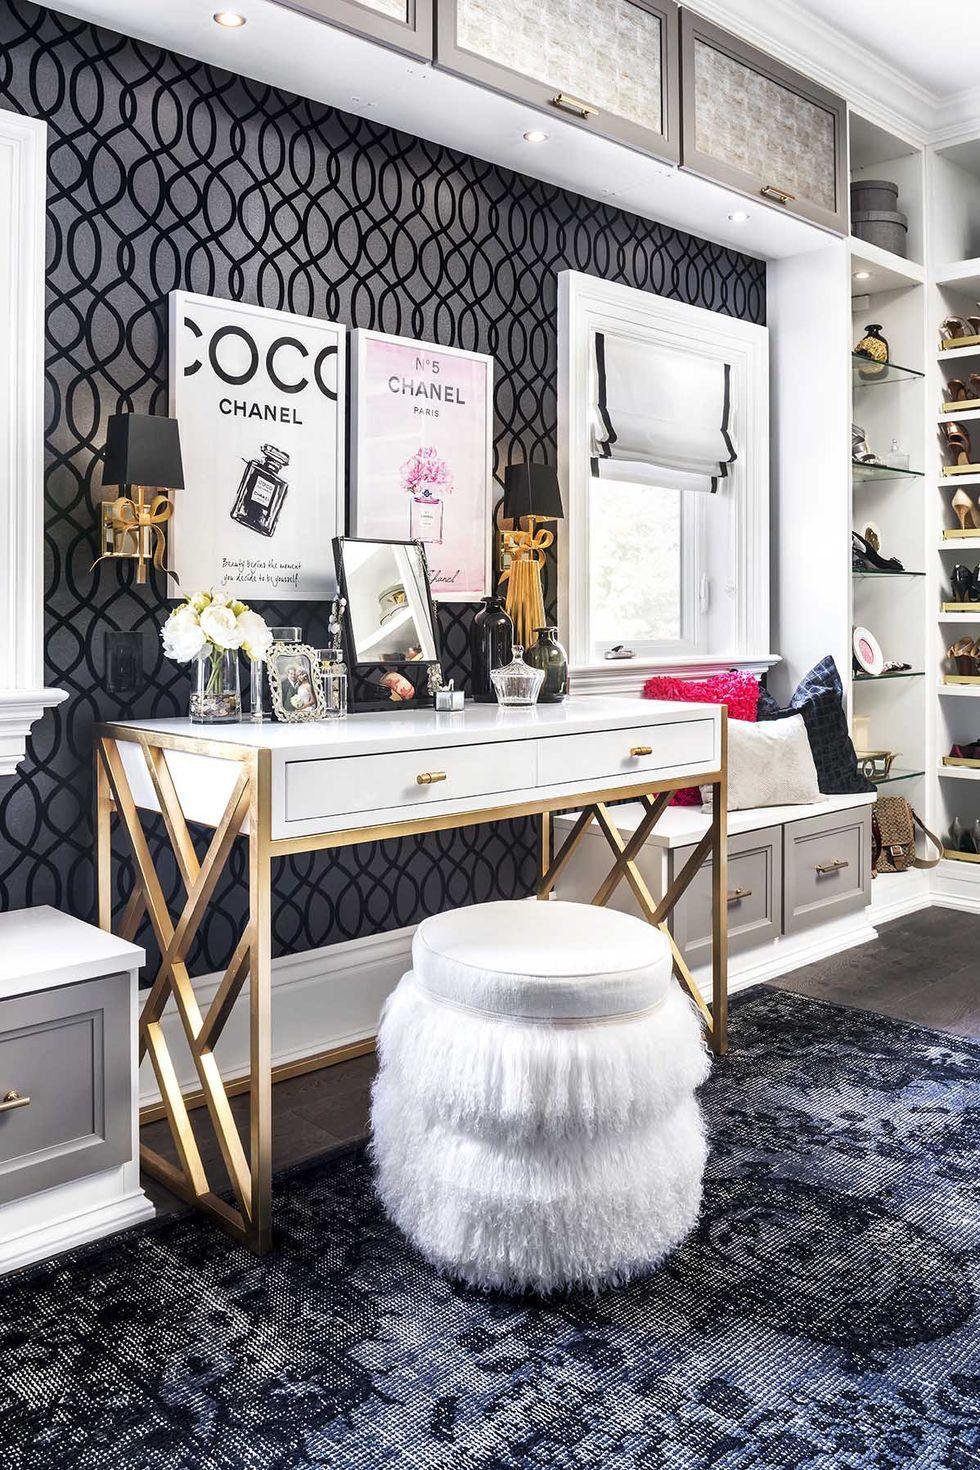 42+ Decoration chambre ado paris ideas in 2021